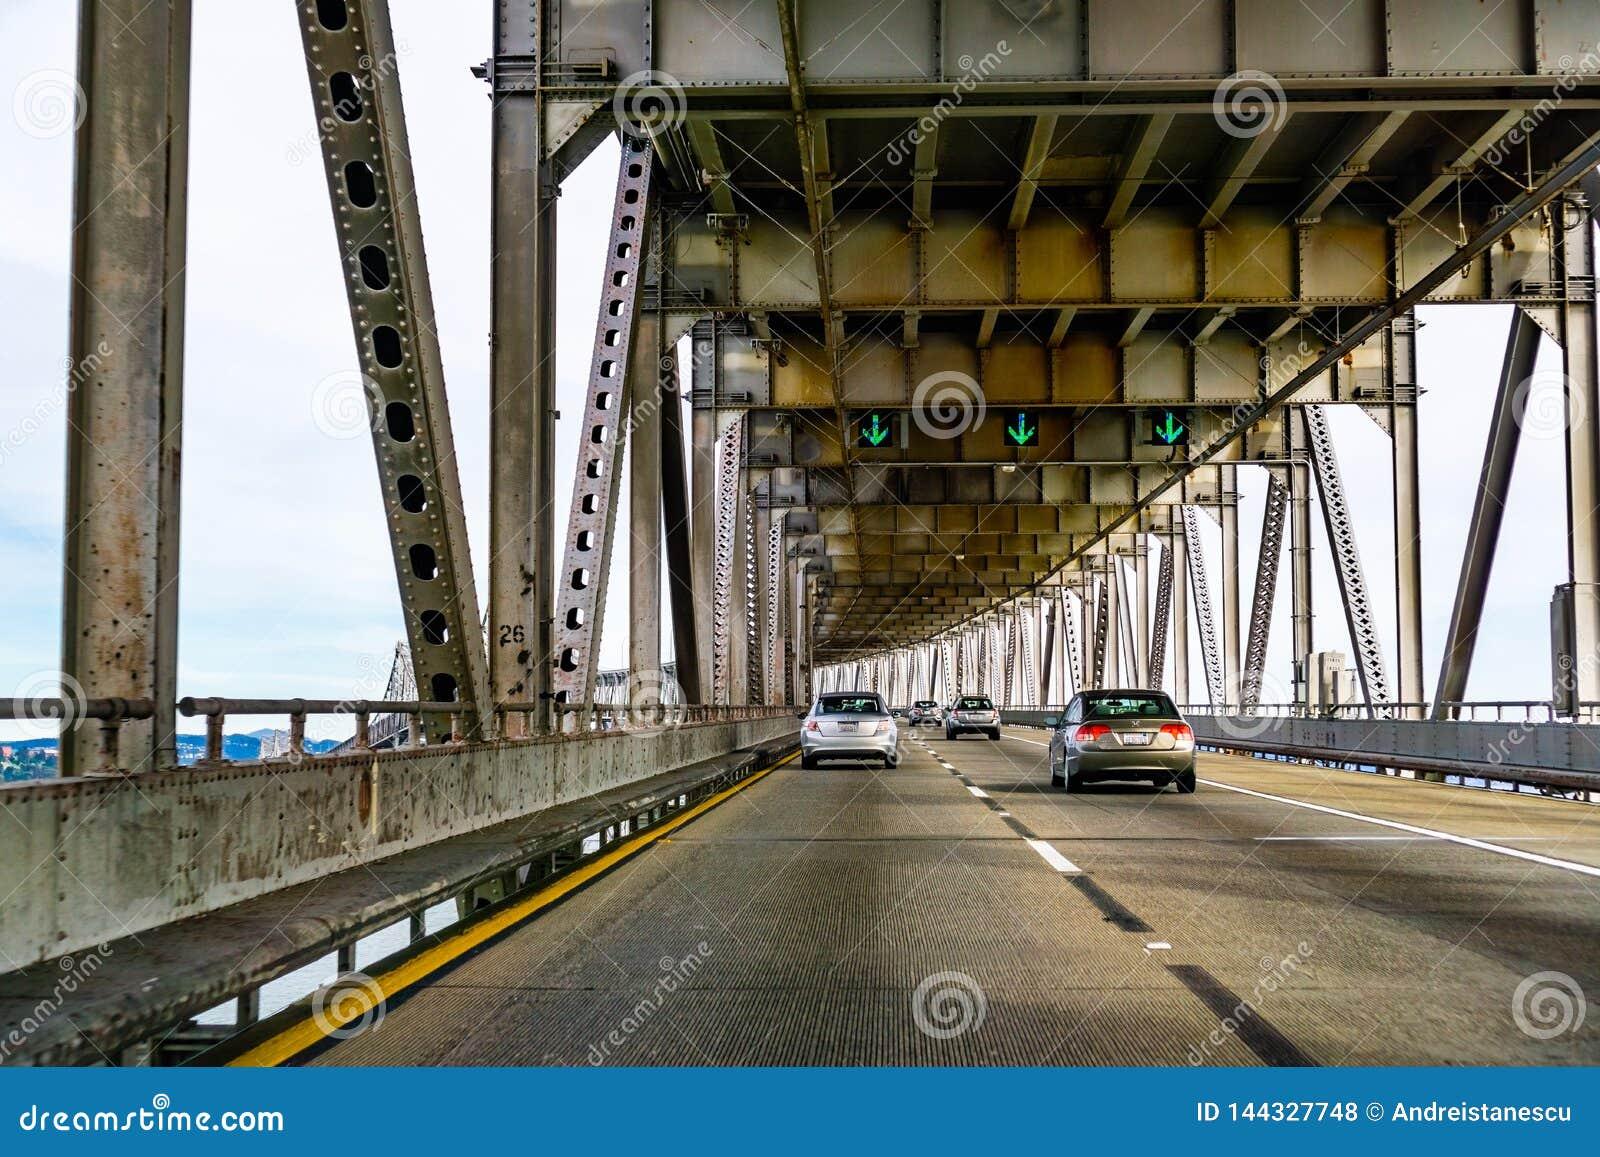 March 31, 2019 Richmond / CA / USA - Driving on Richmond - San Rafael bridge John F. McCarthy Memorial Bridge, San Francisco bay